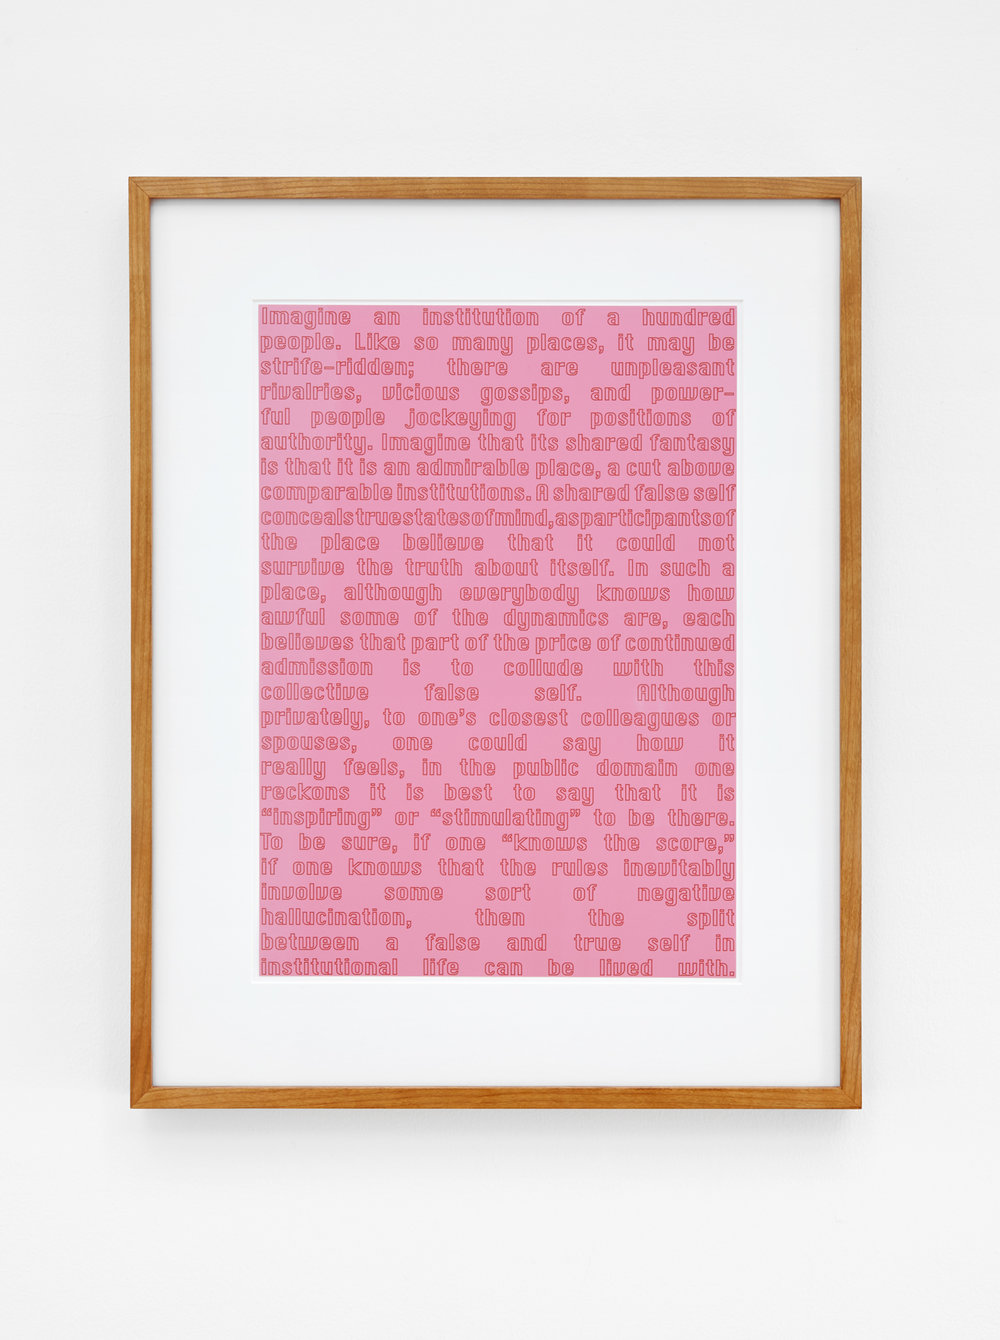 Anna Susanna Woof Untitled 2016 Framed C-print 42 x 29.7 cm Ed 2 + 1 AP